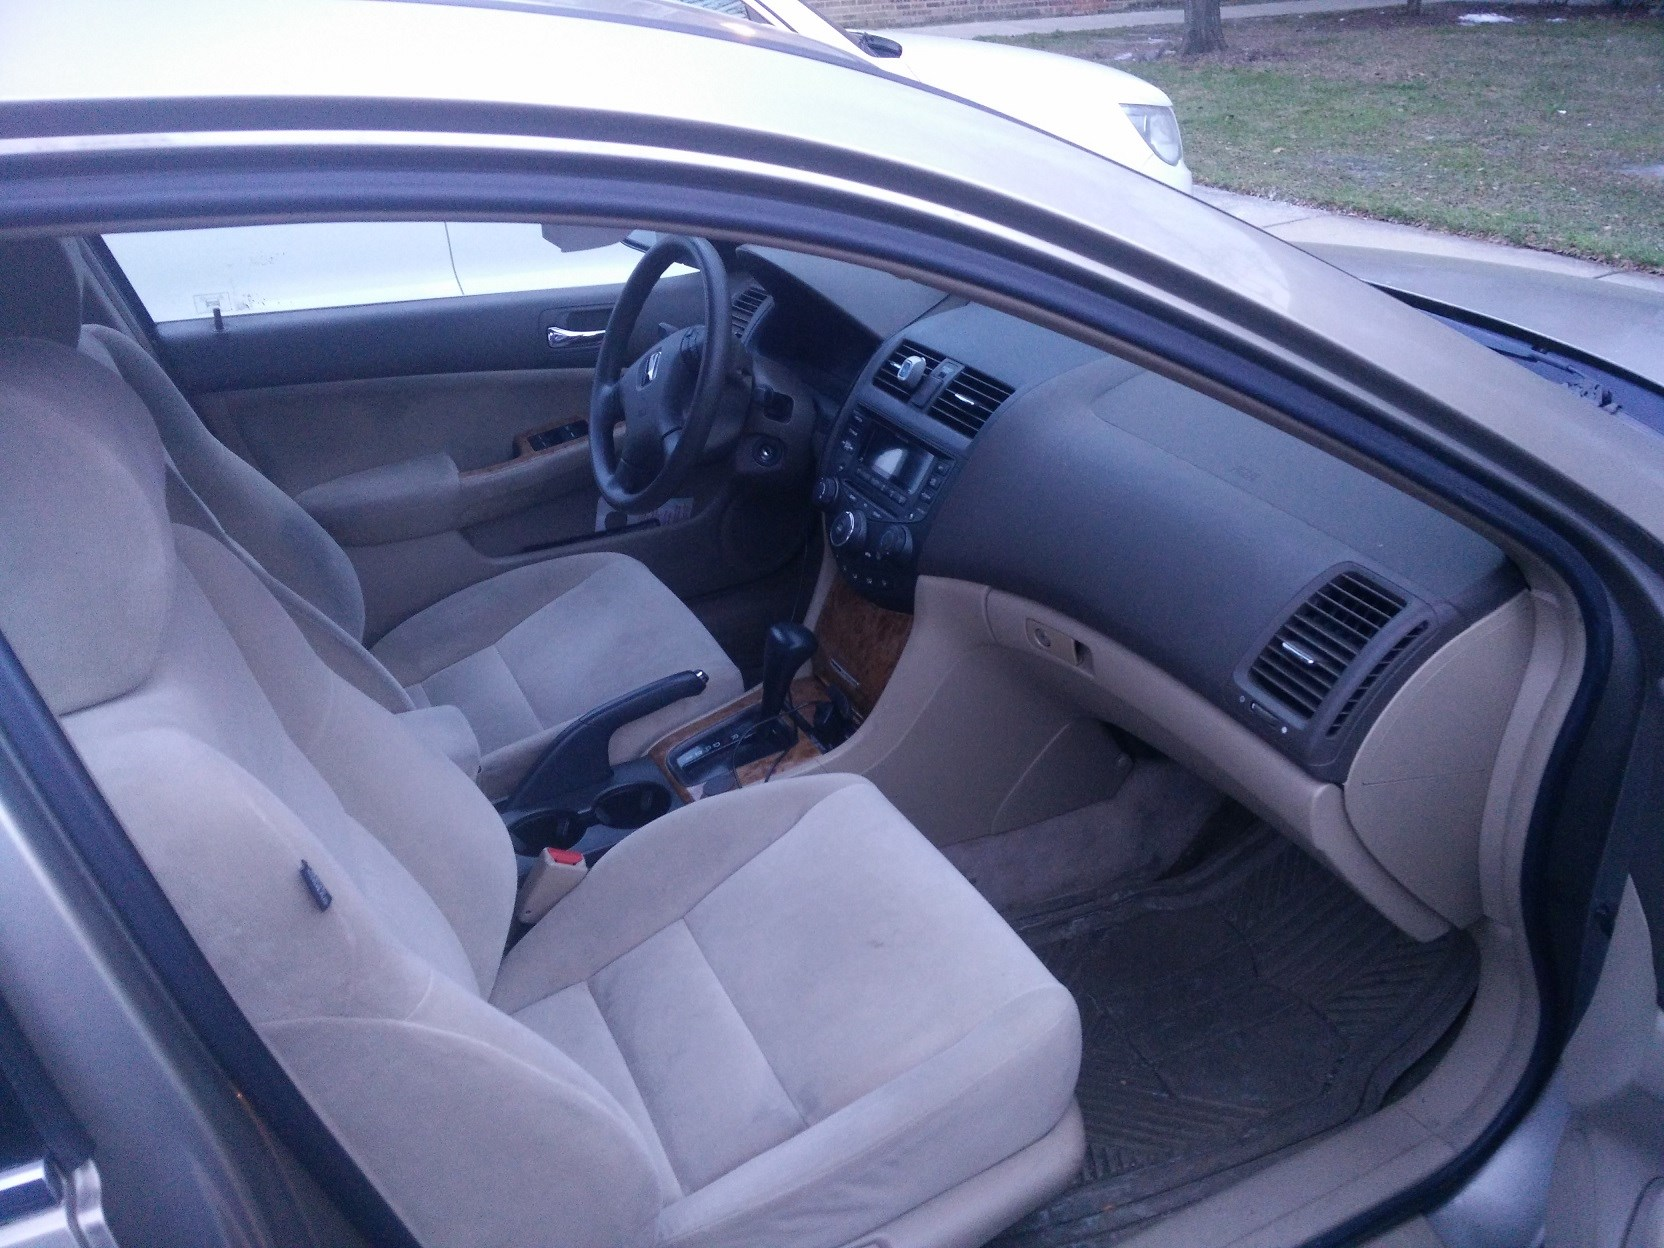 2004 Honda Accord EX Sedan 4D For Sale By Owner - $3200/ Used Honda ...